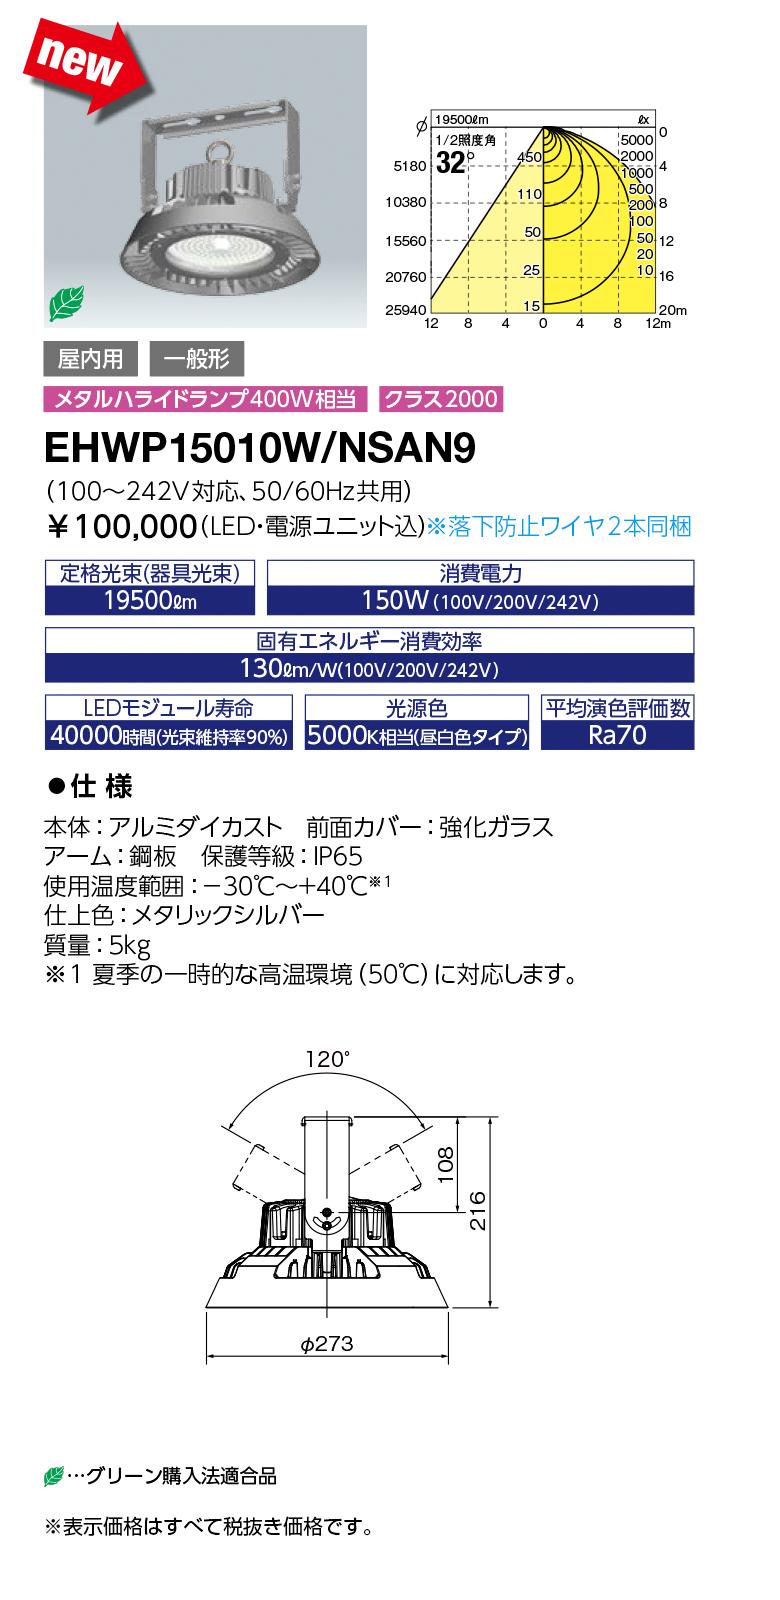 EHWP15010W/NSAN9